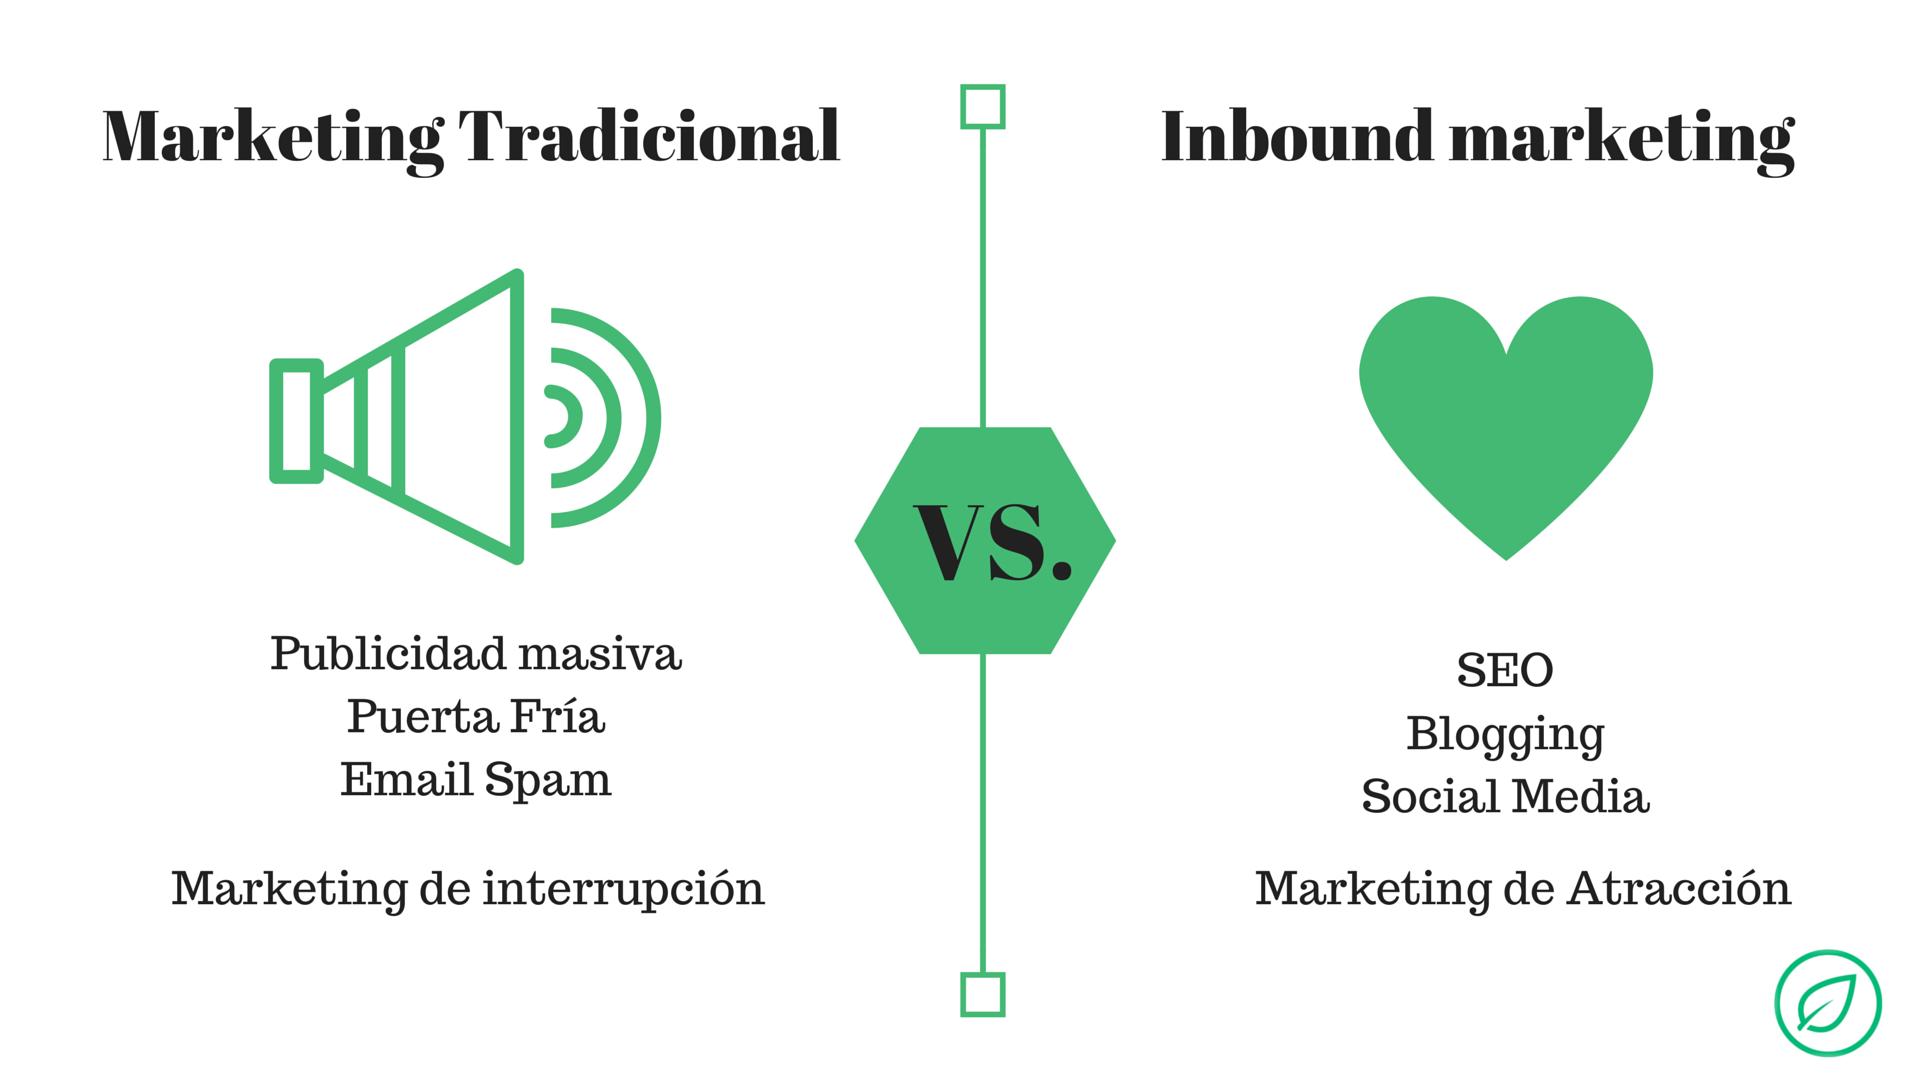 Marketing Tradicional vs. Inbound Marketing